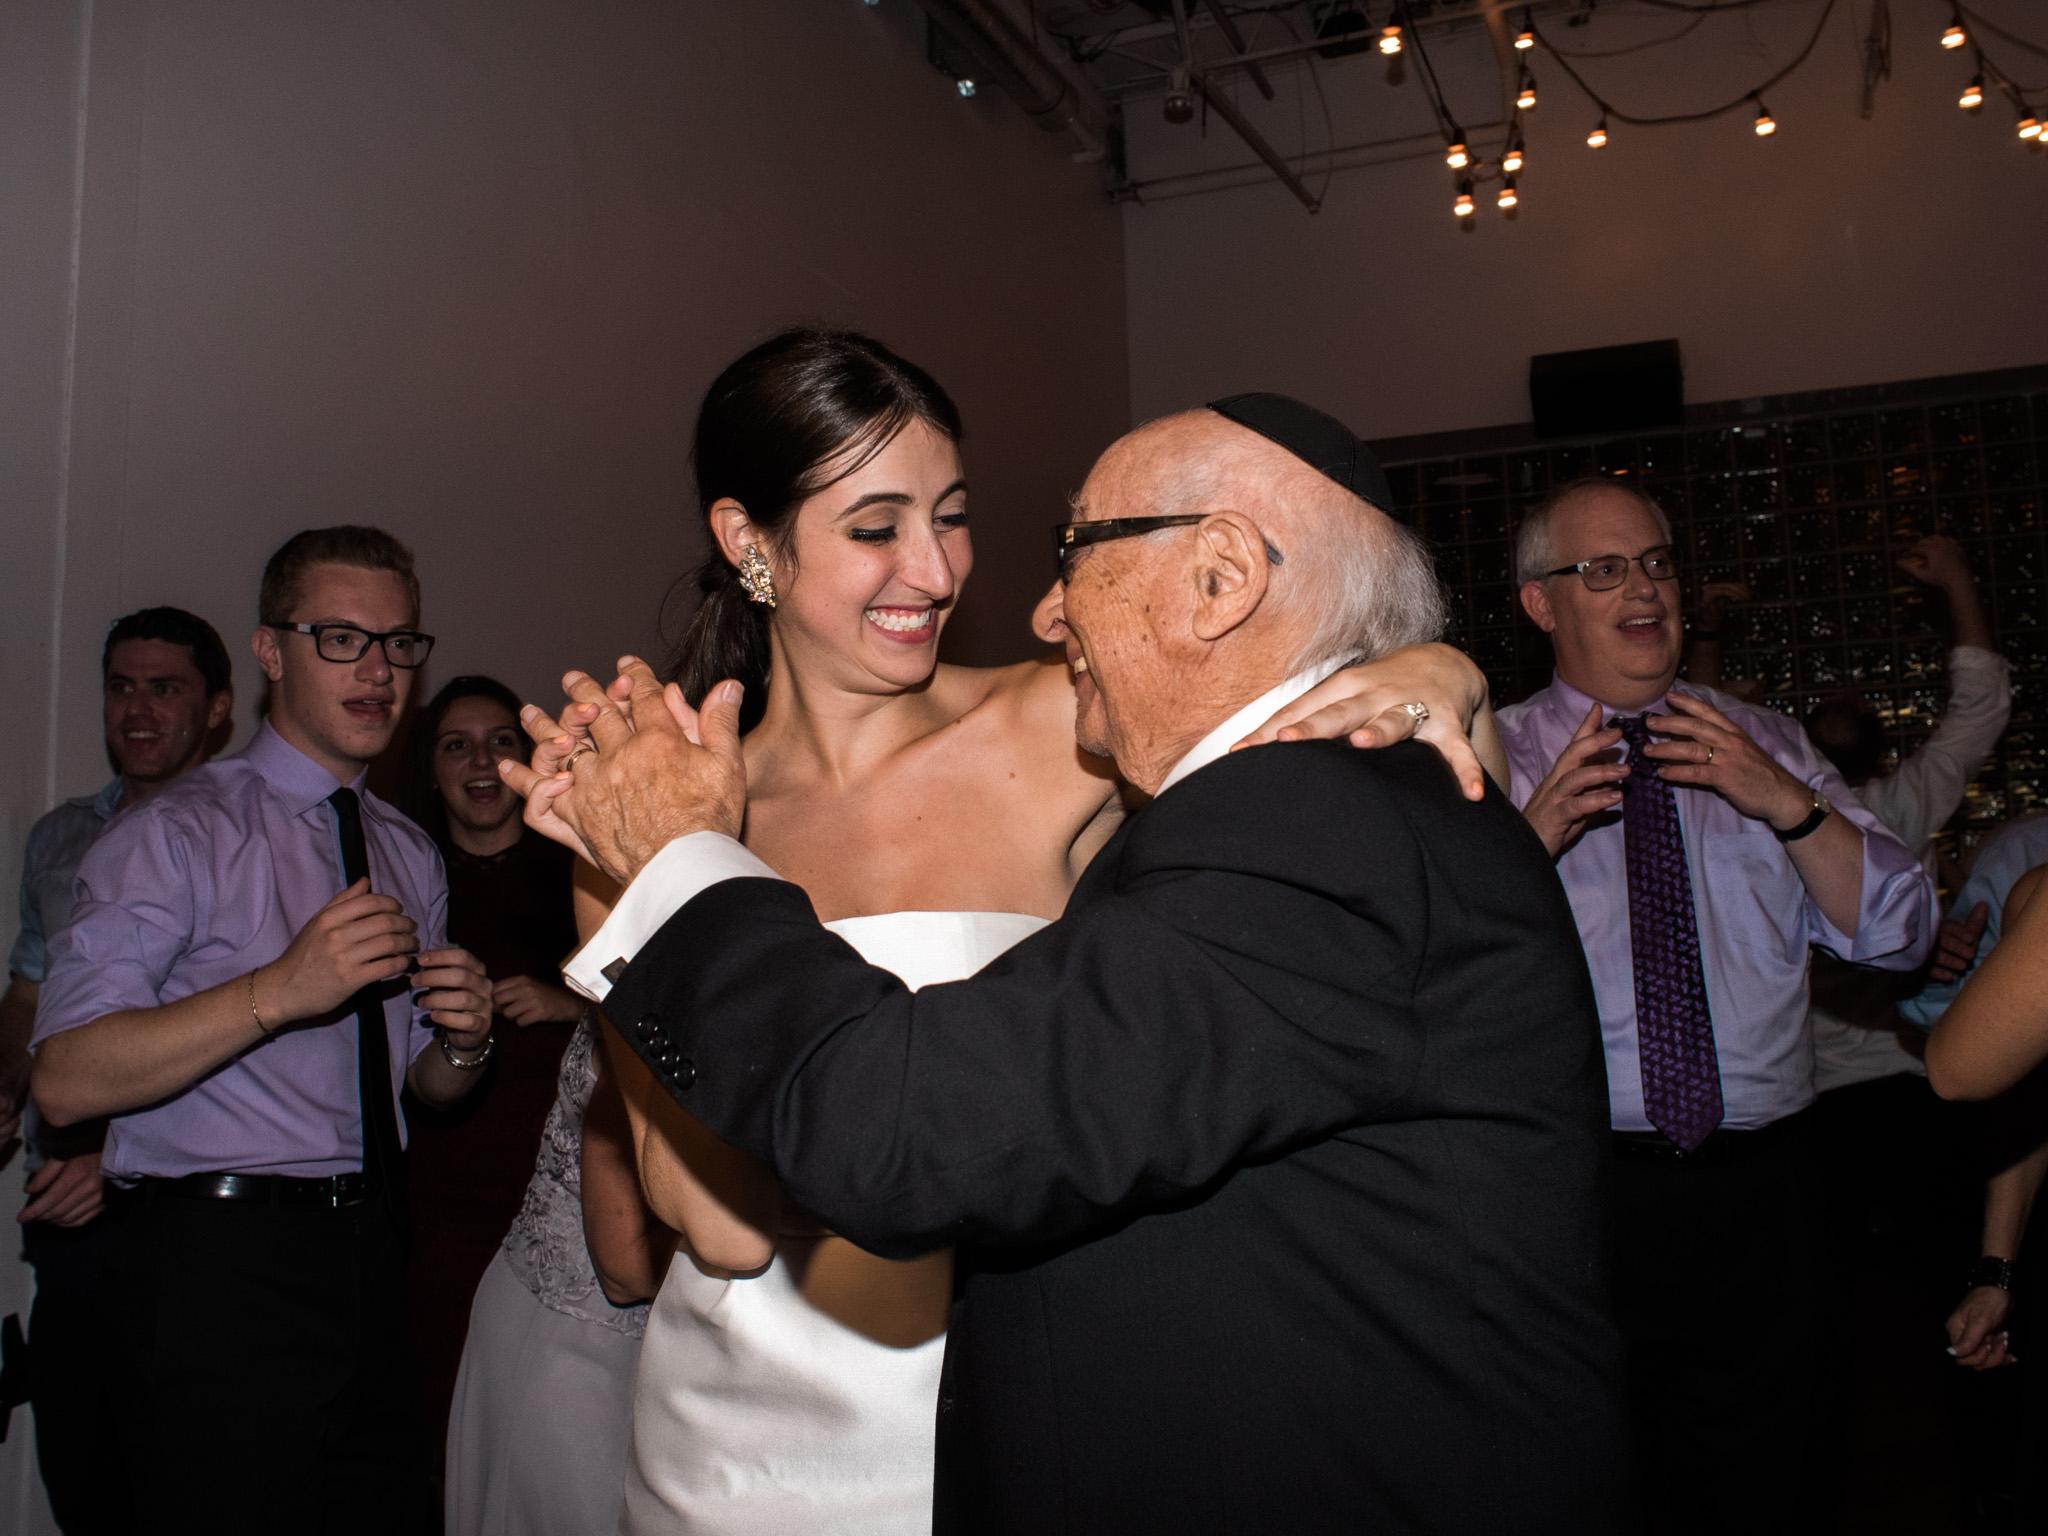 Gladstone-Toronto-Wedding-99-sudbury-74.jpg